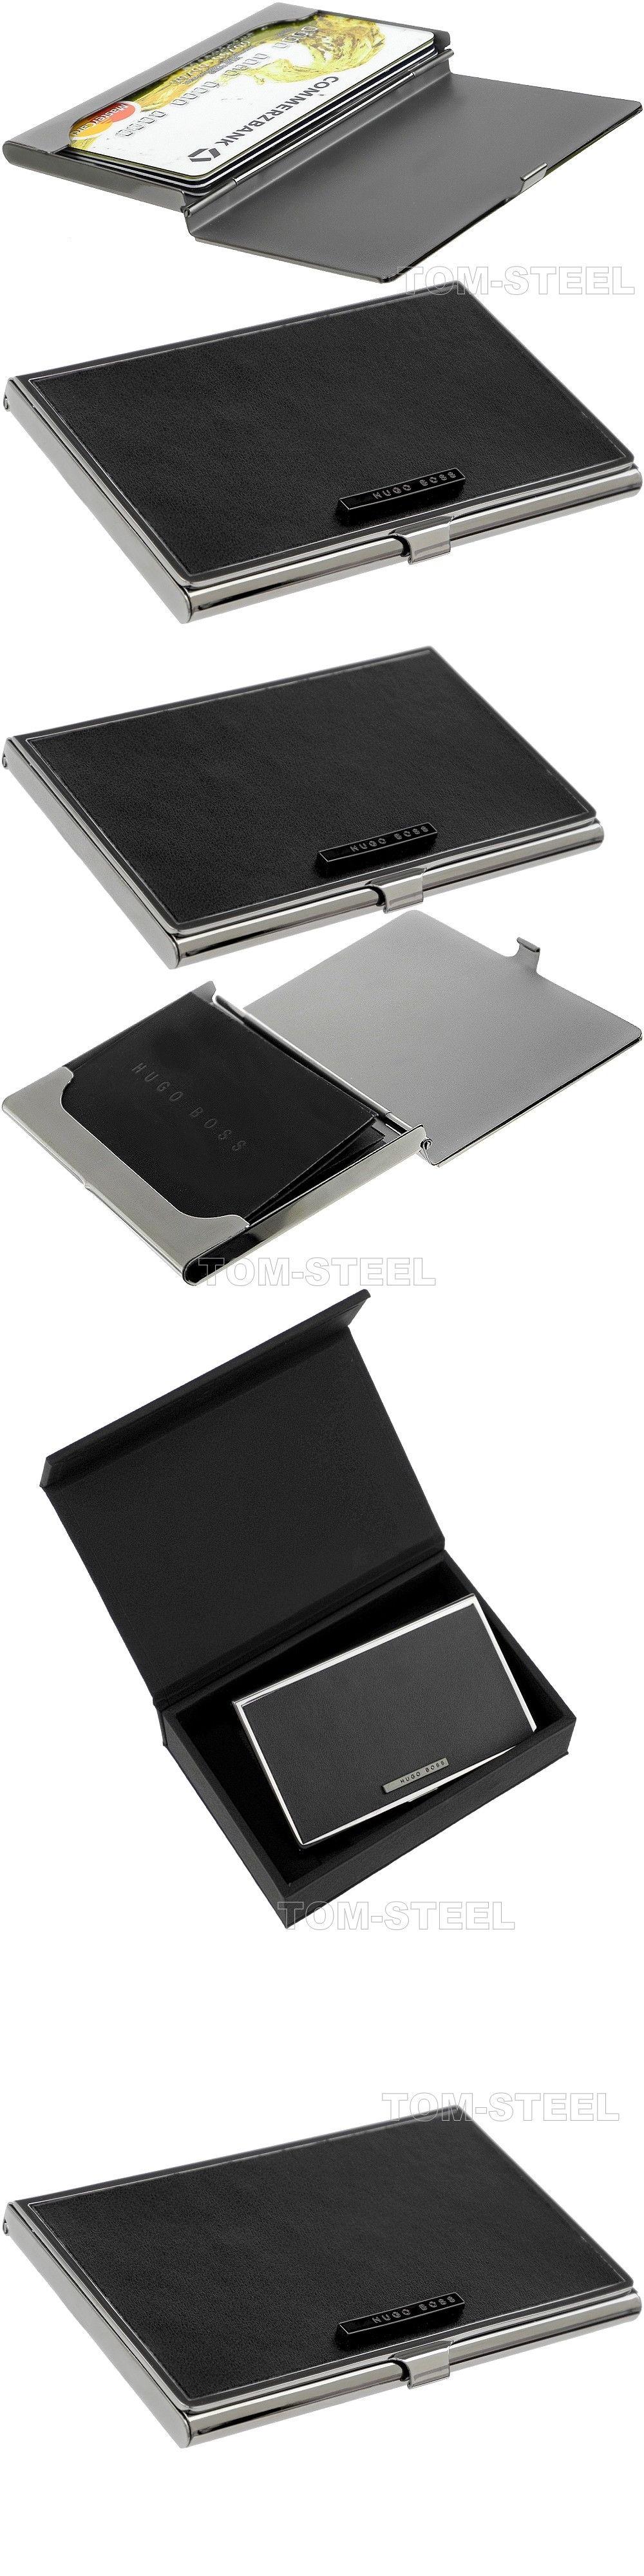 Checkbook Holders 105408: Hugo Boss Stainless Steel Credit Card Case ...